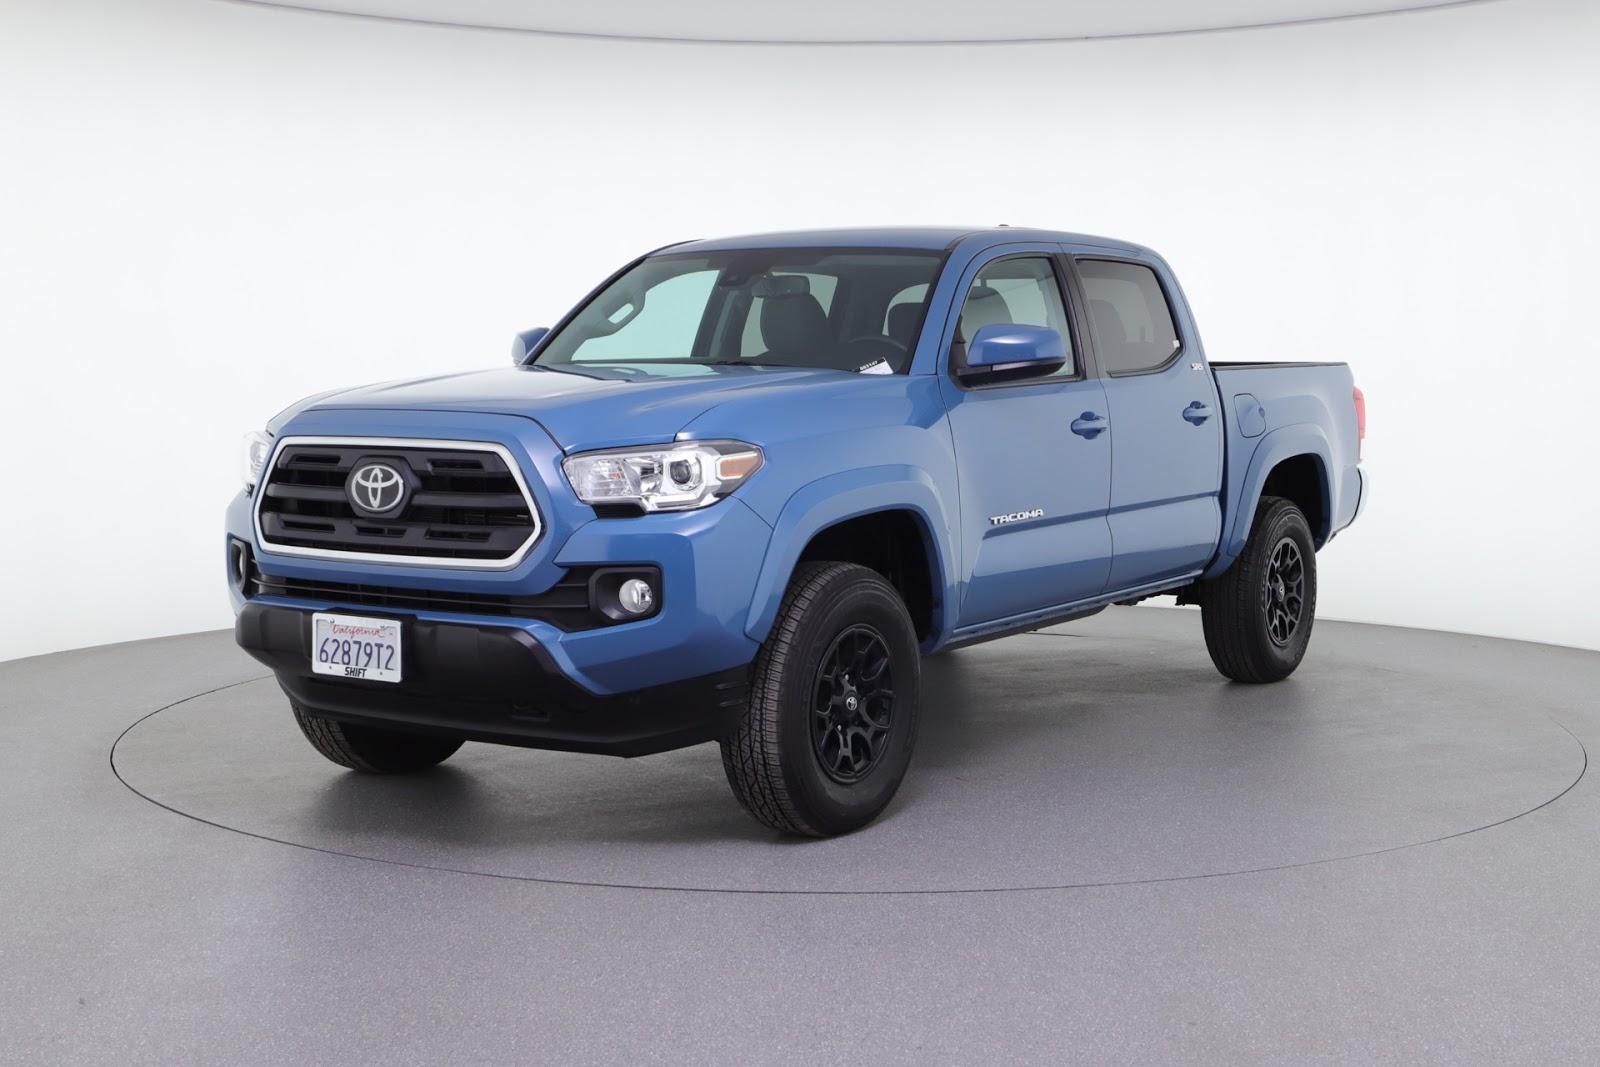 2019 Toyota Tacoma SR5 (from $32,900)